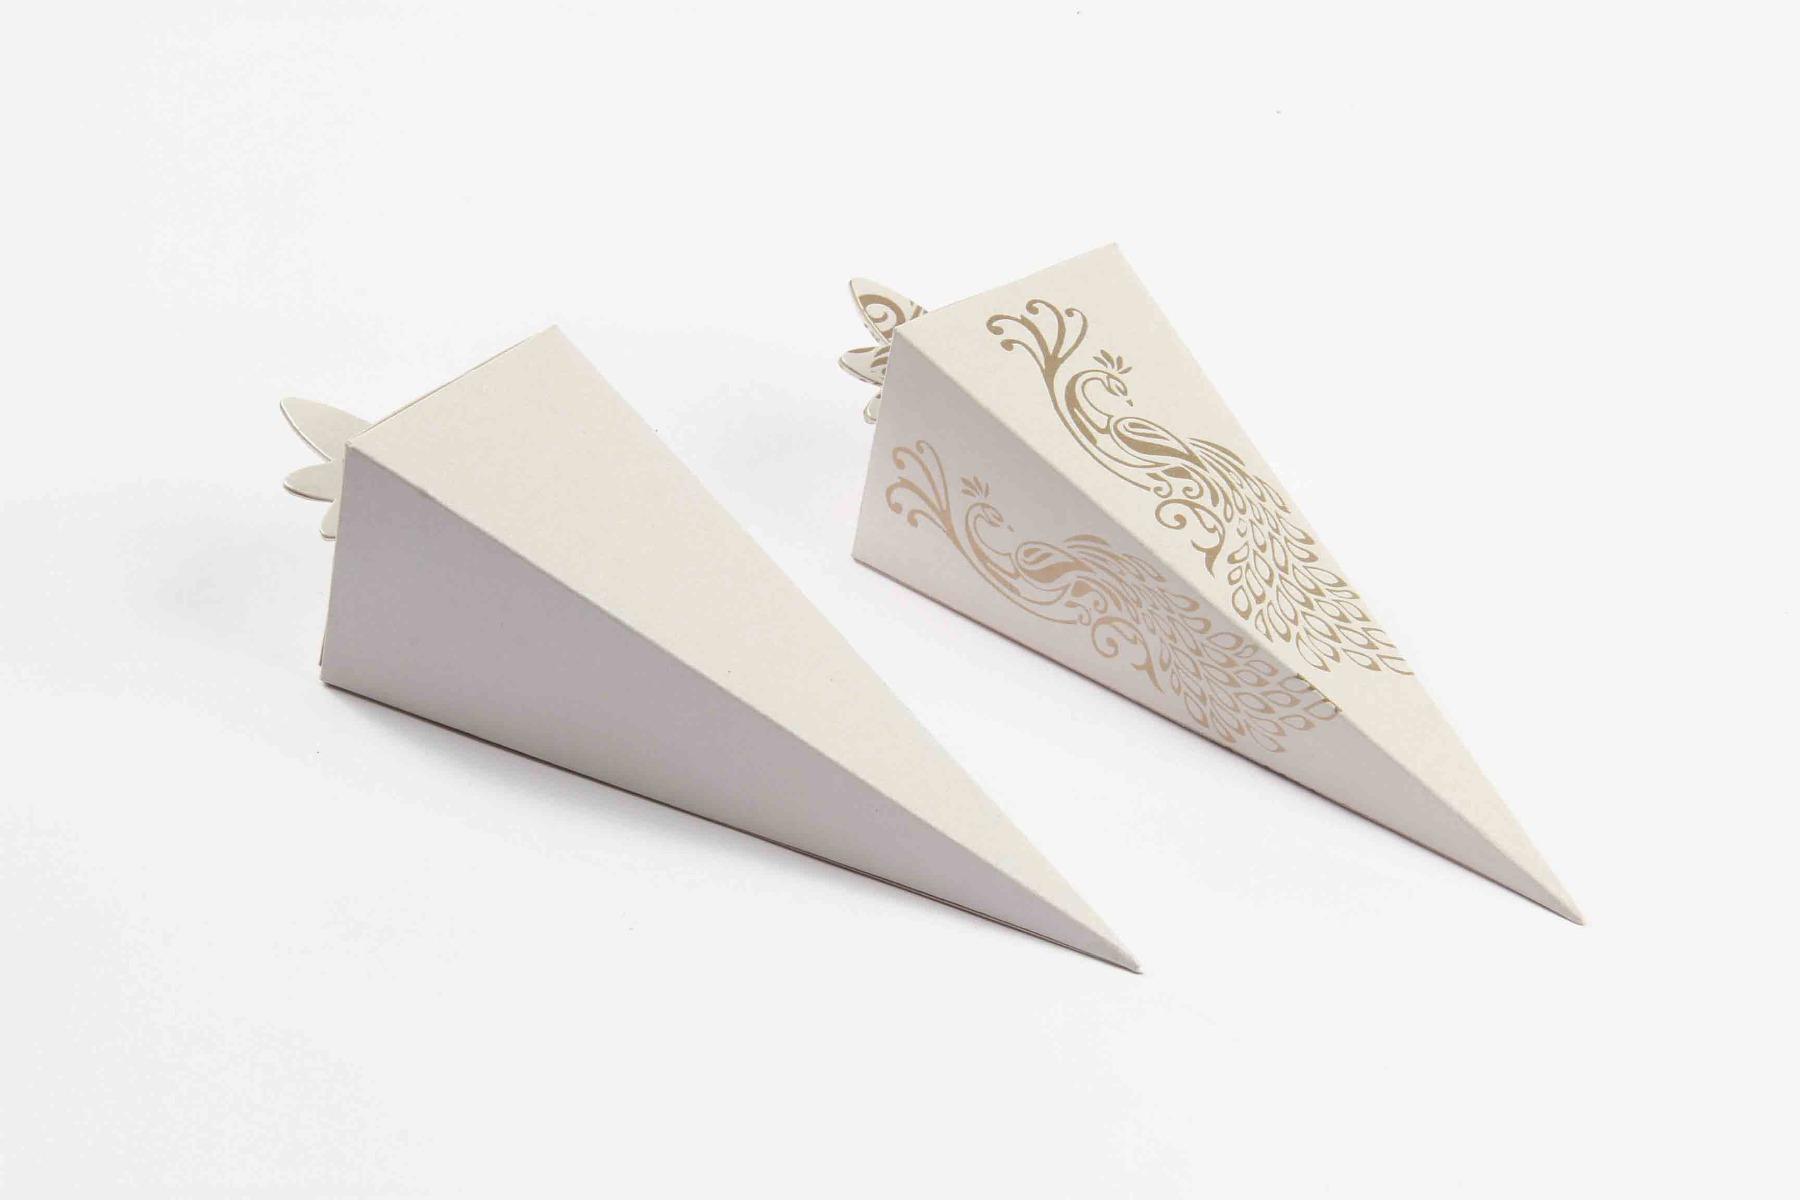 Cone Shaped Favor Box No 8 - White-8616